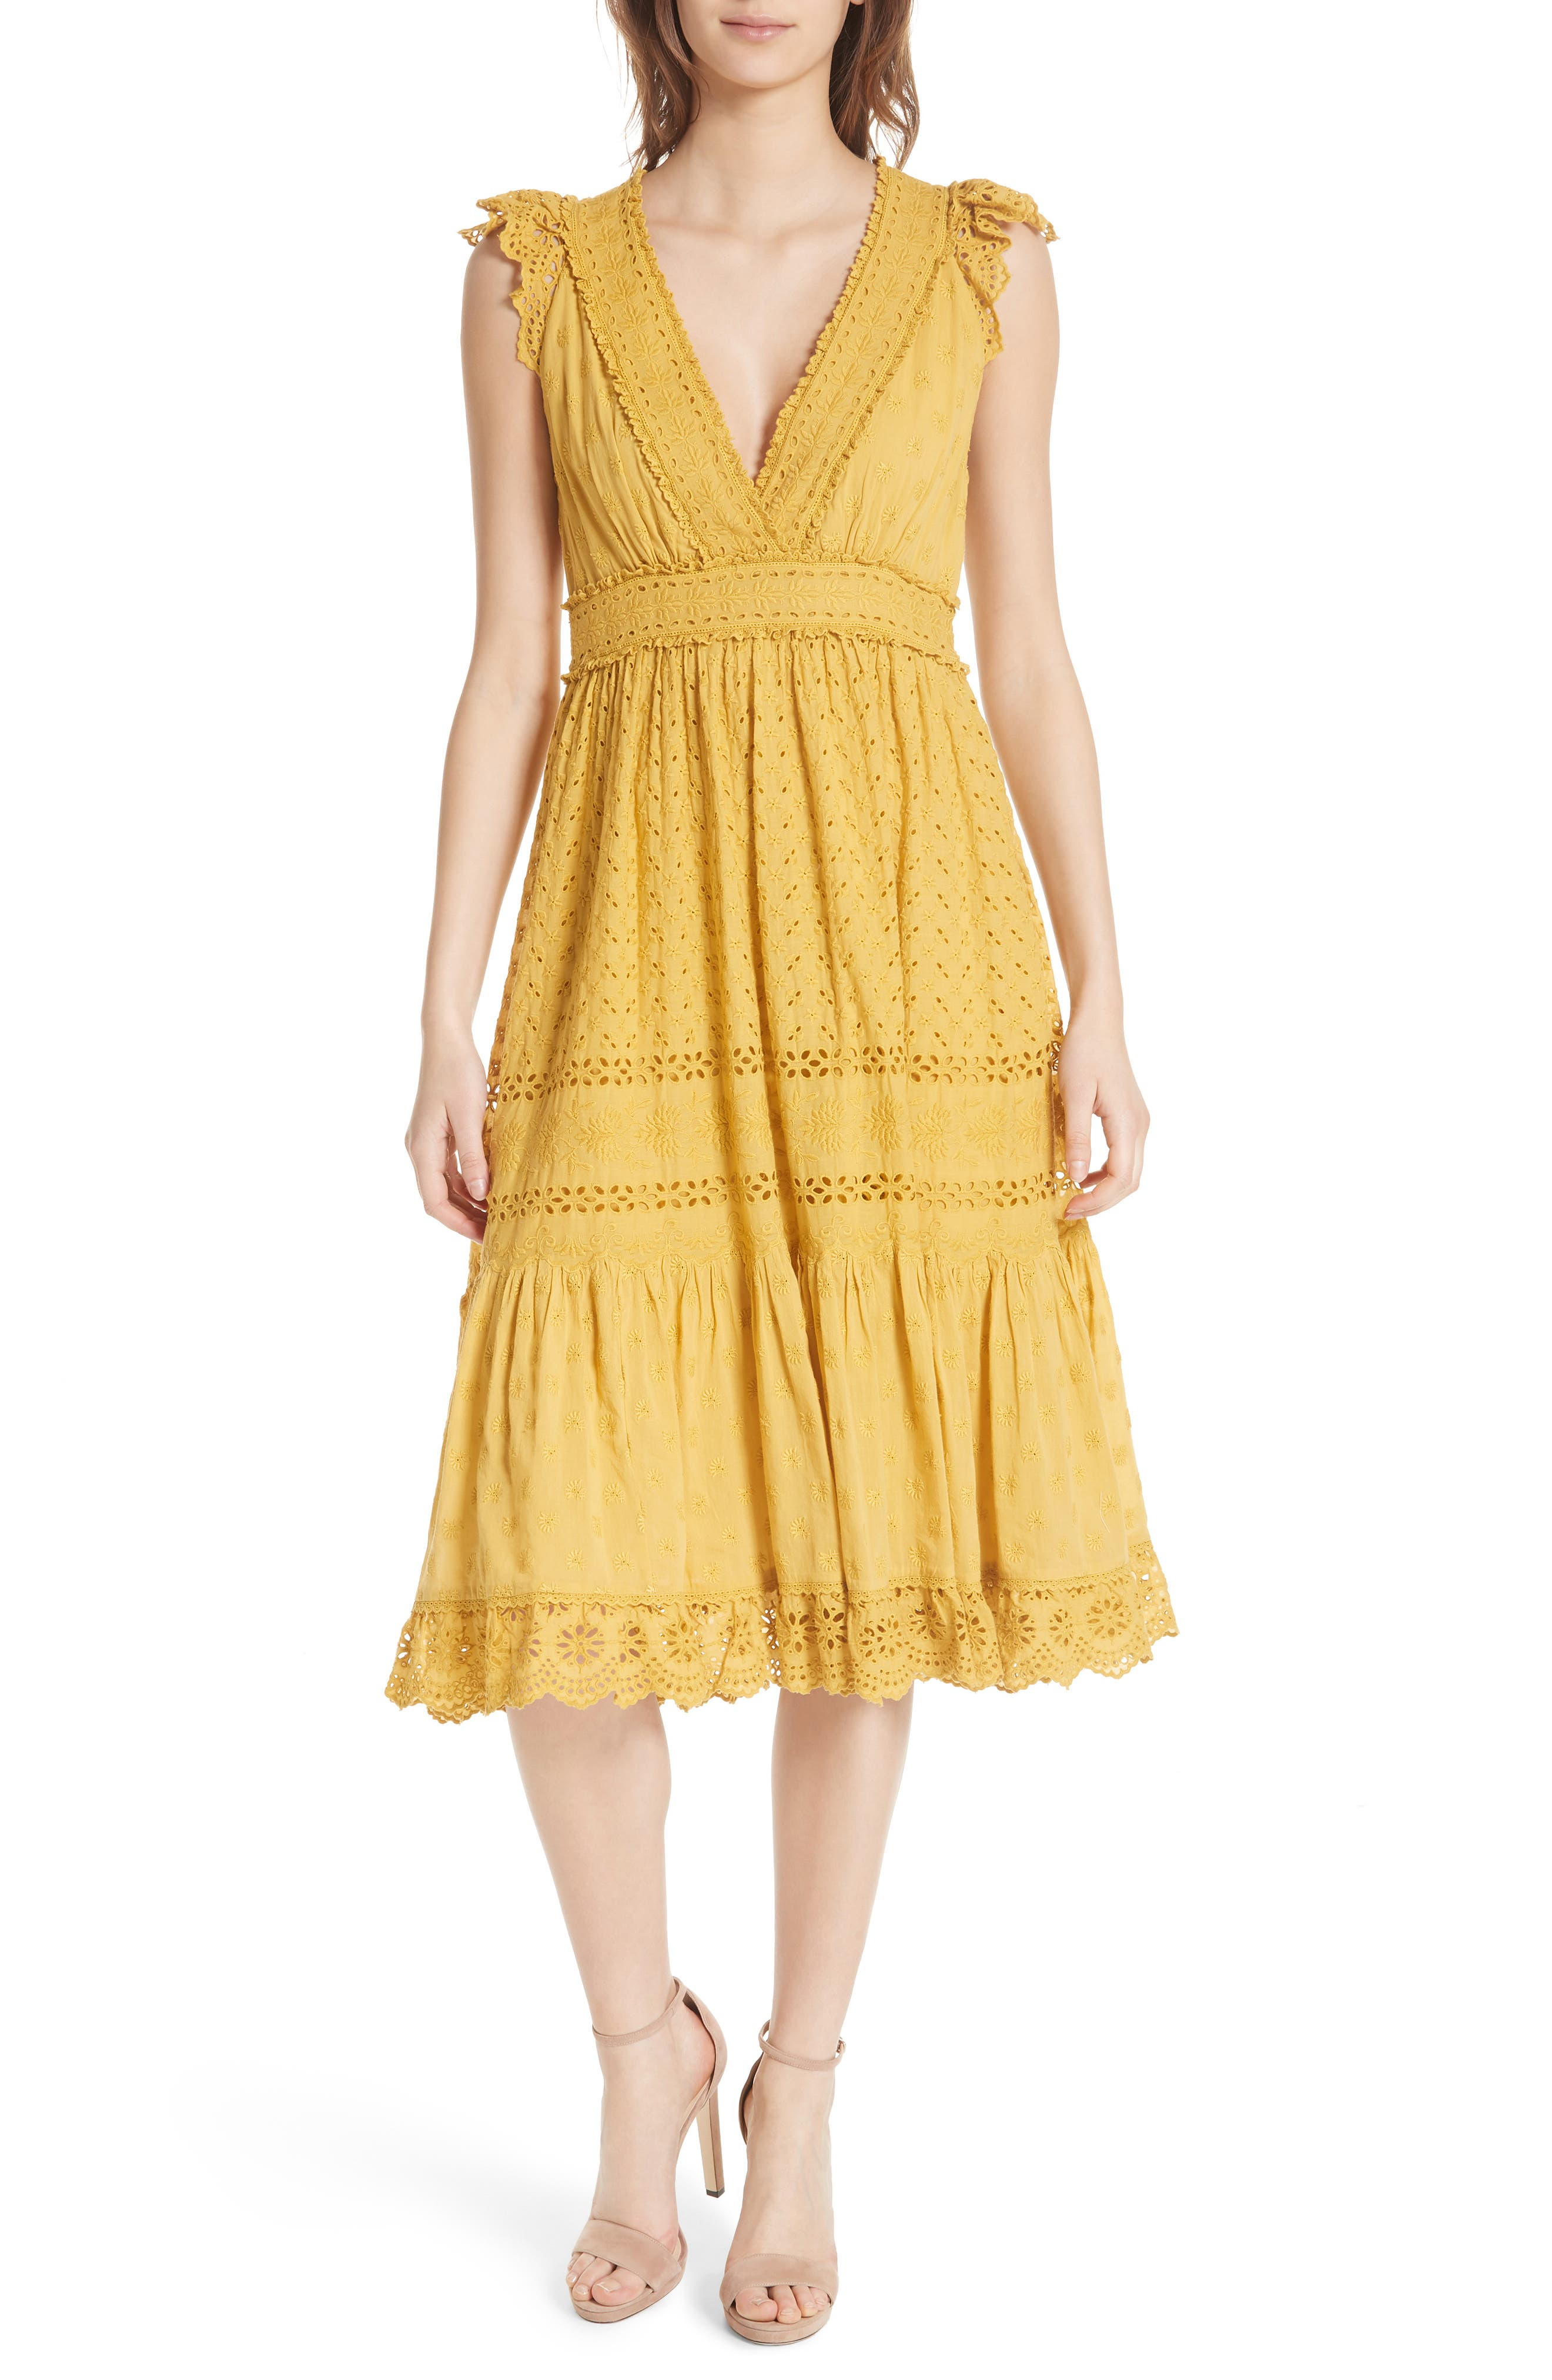 Marjorie Eyelet Dress,                             Main thumbnail 1, color,                             700